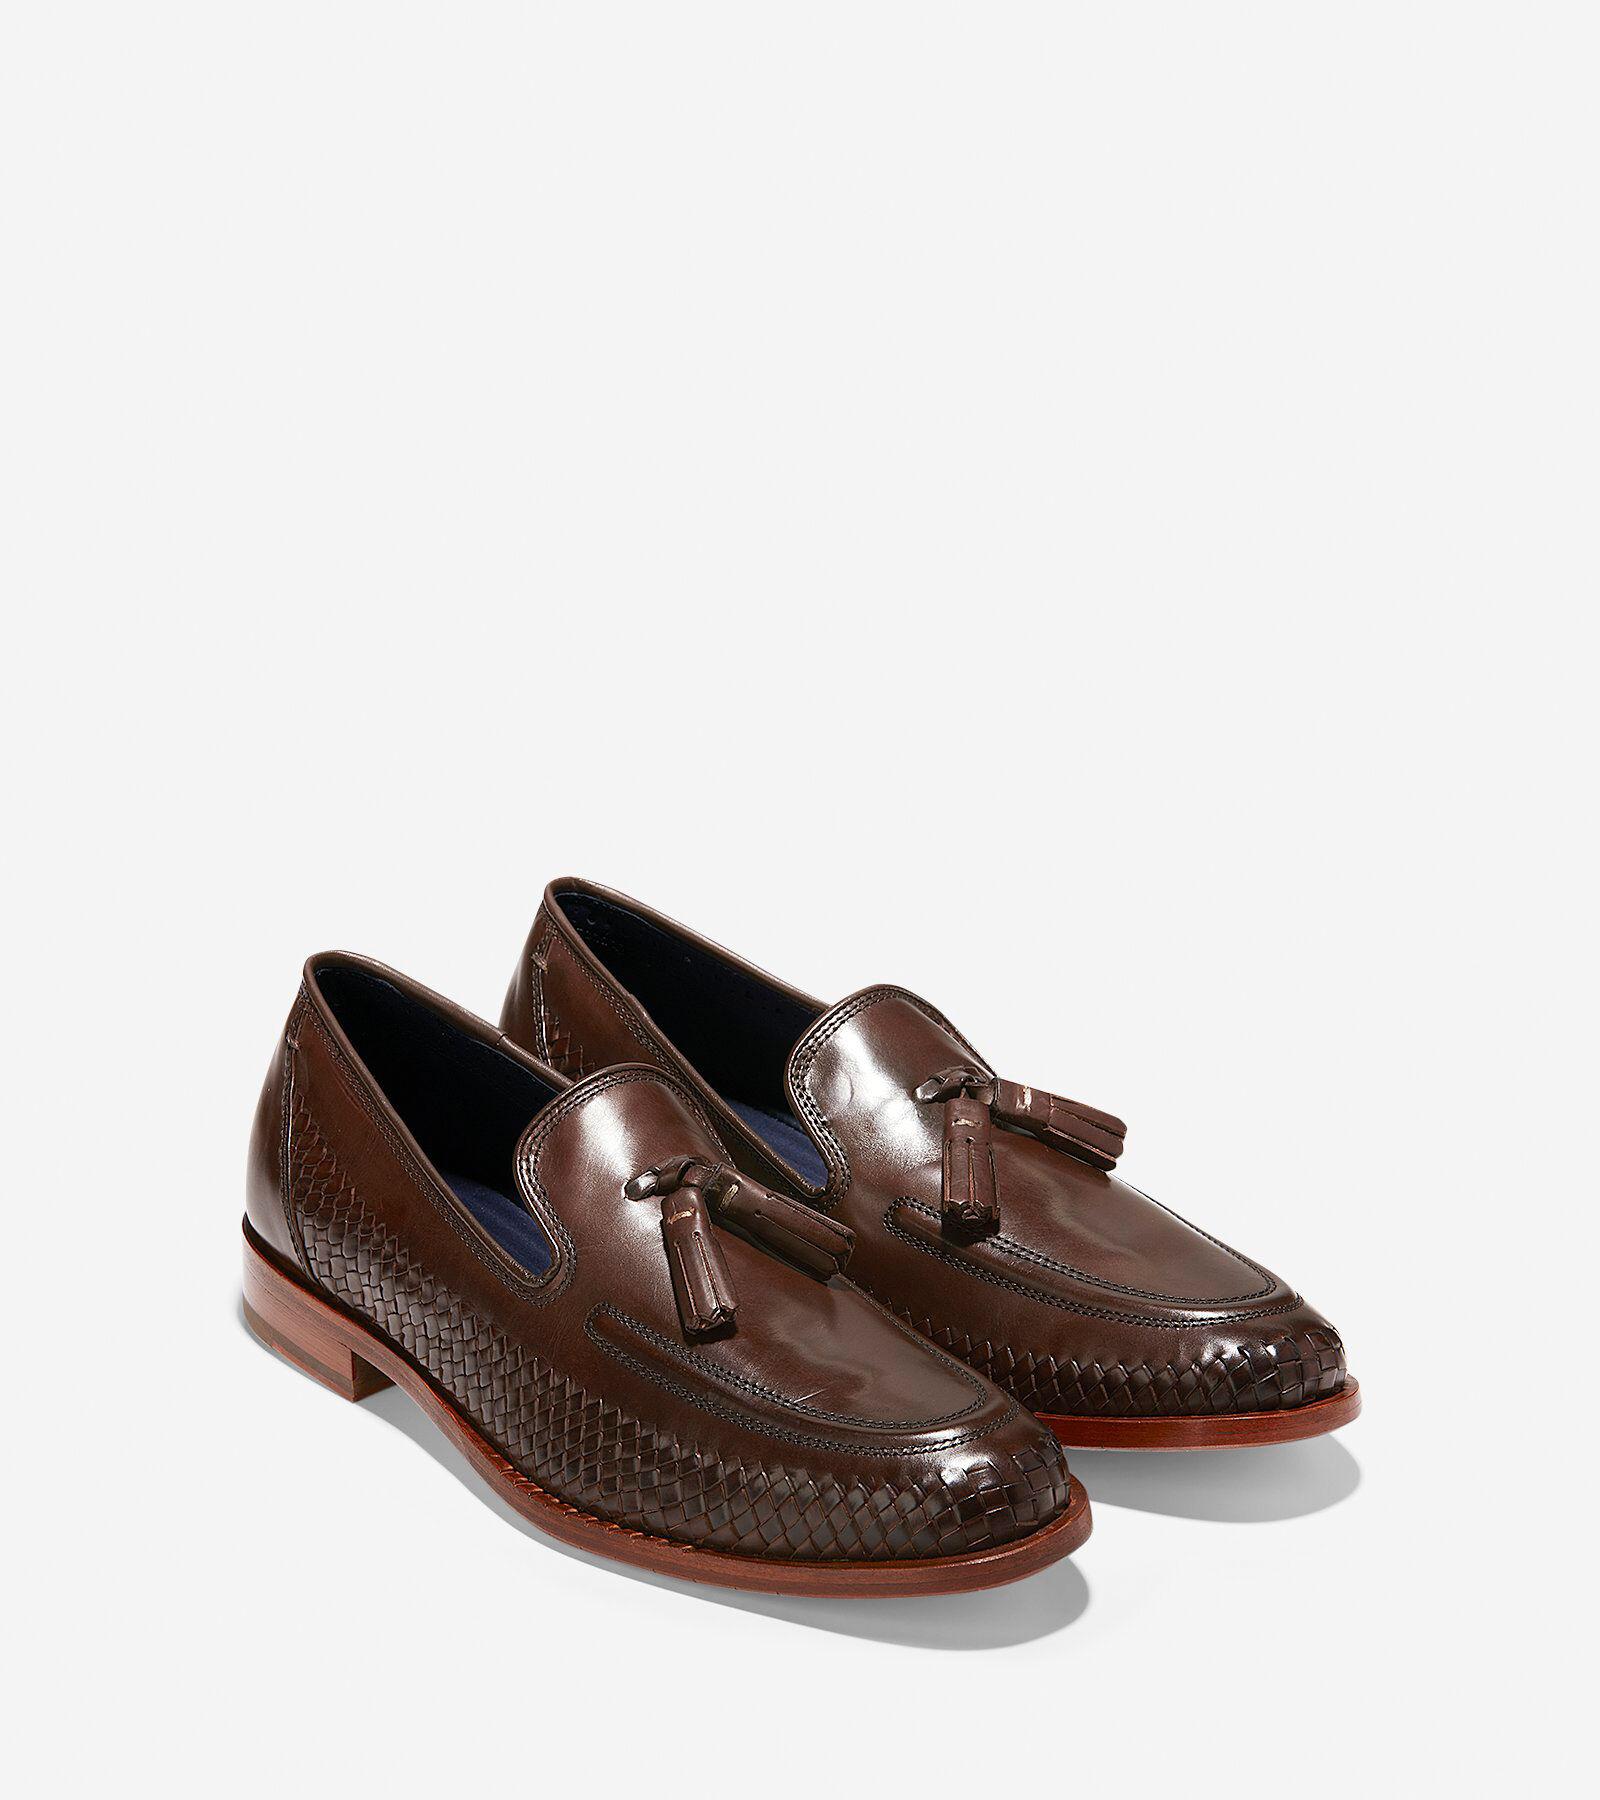 Washington Loafer cheap sale visit under $60 sale online outlet for nice bIjXpxy